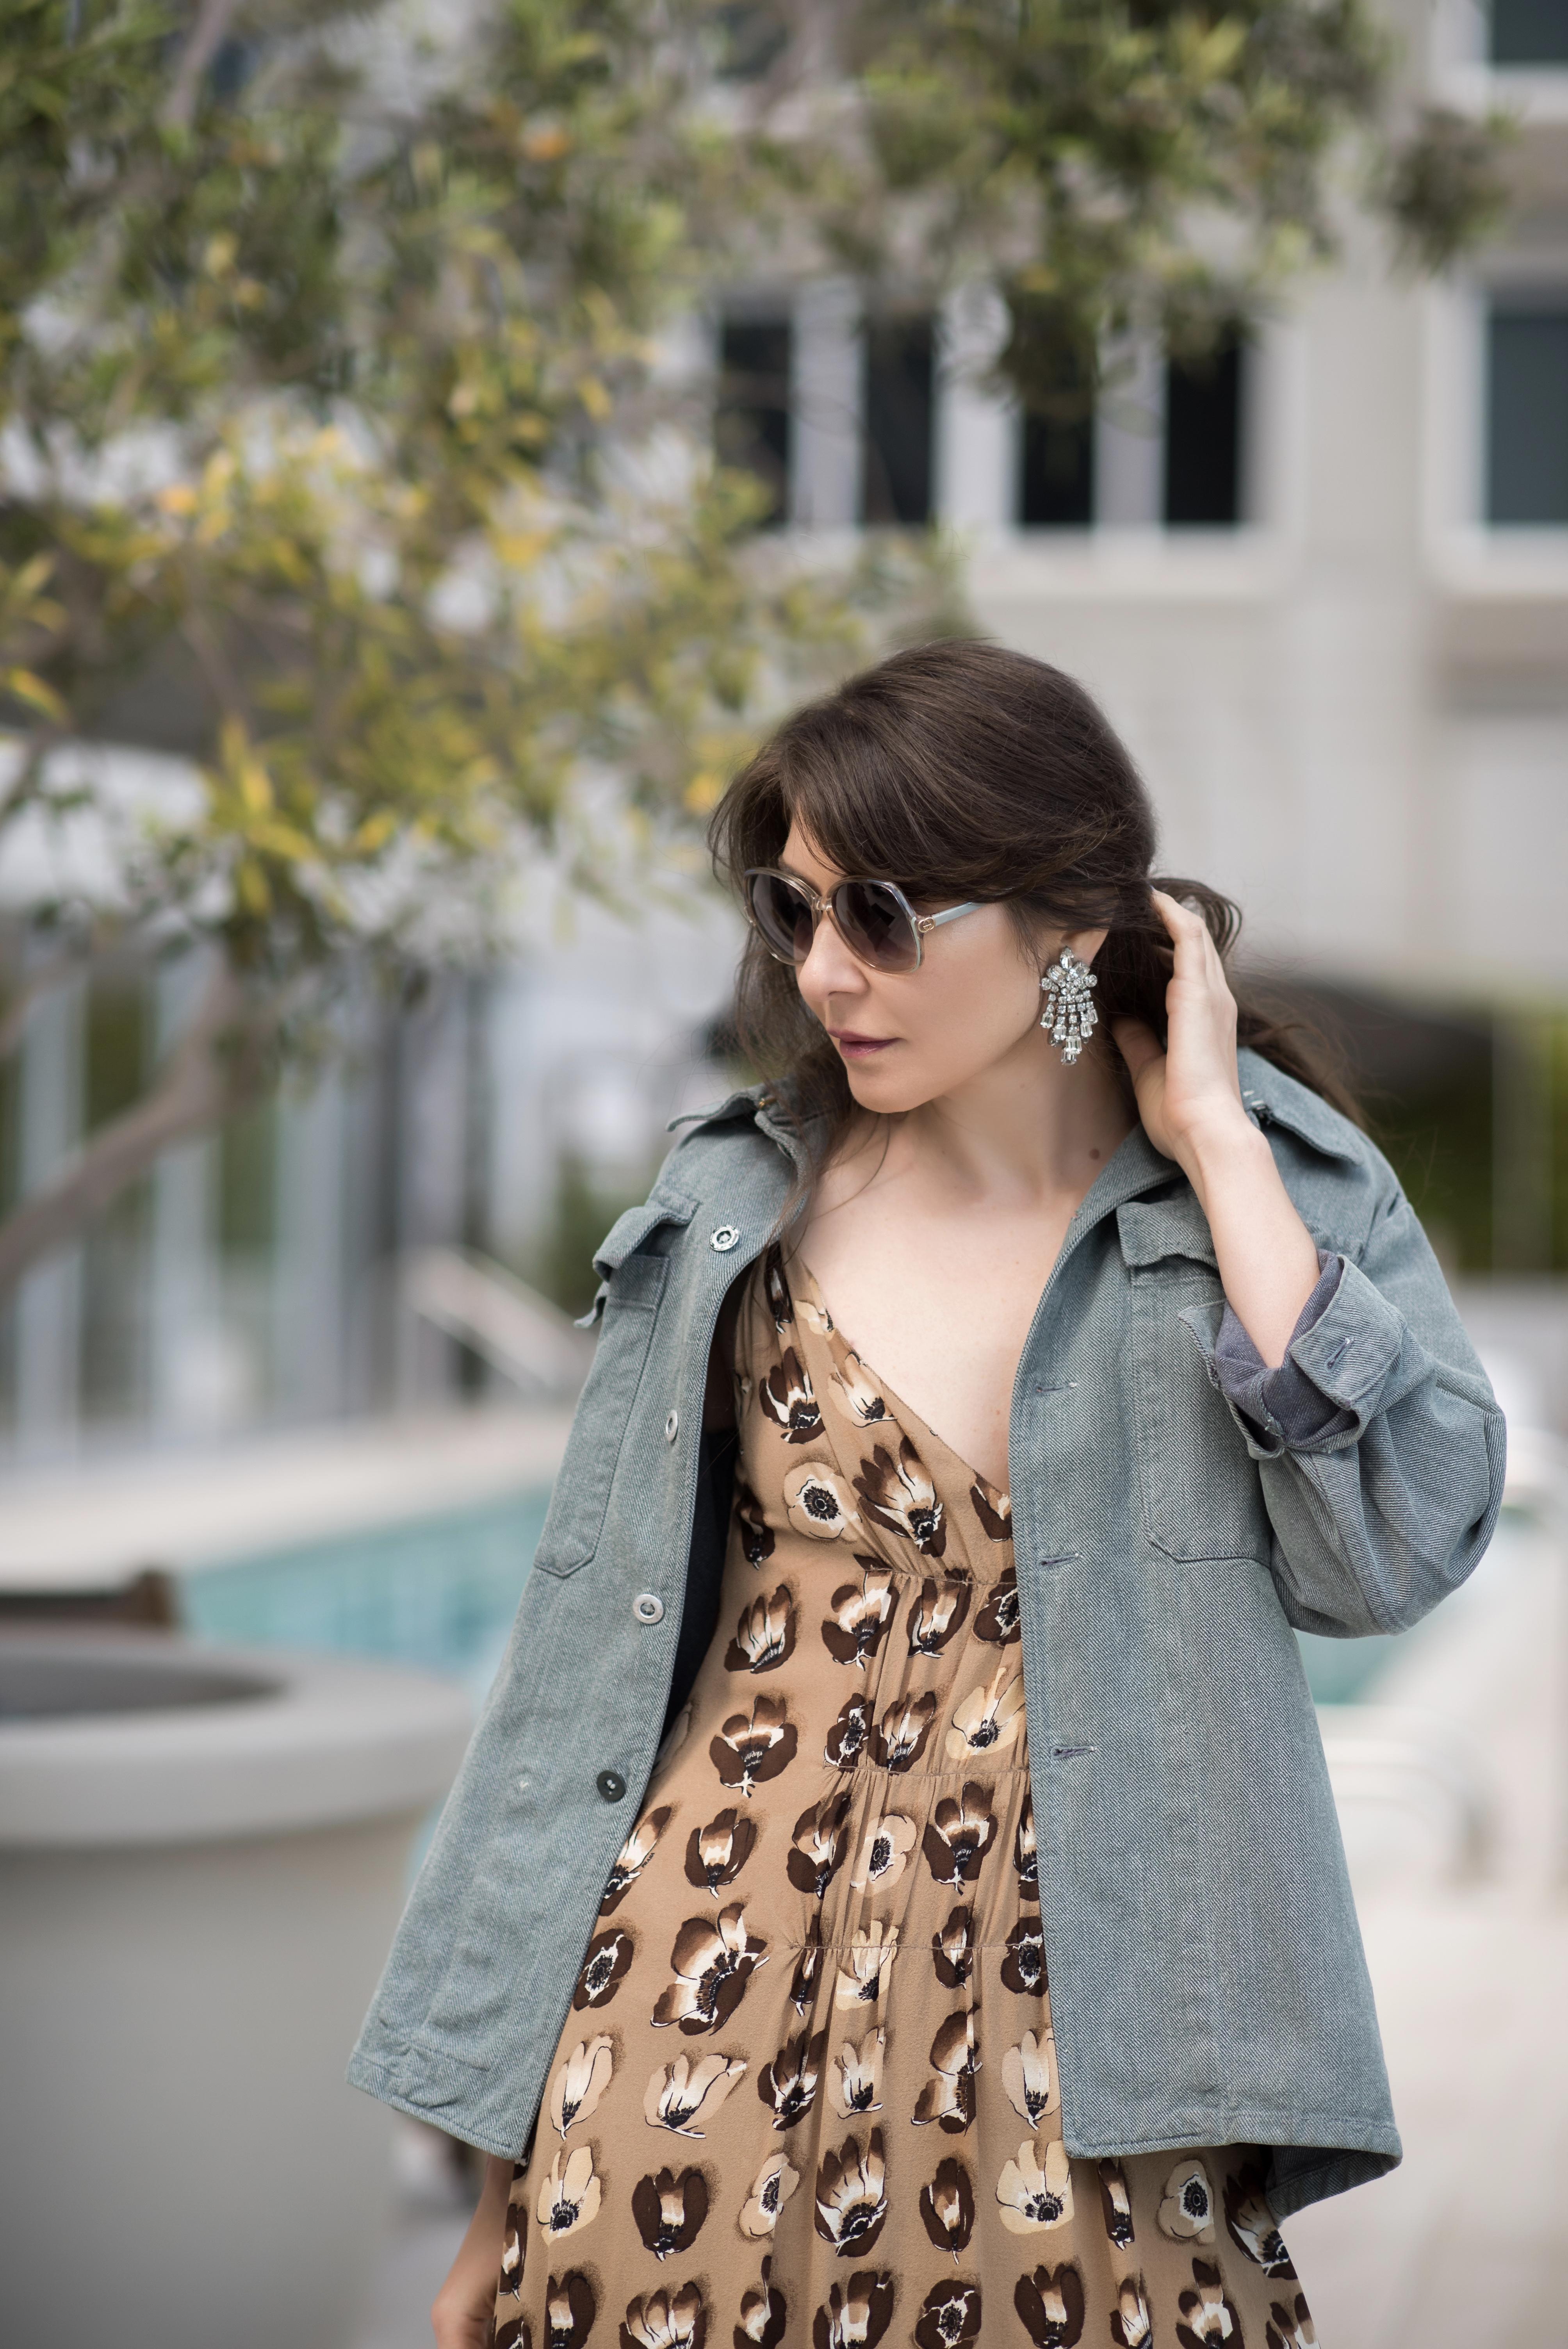 Slip dress and denim jacket.